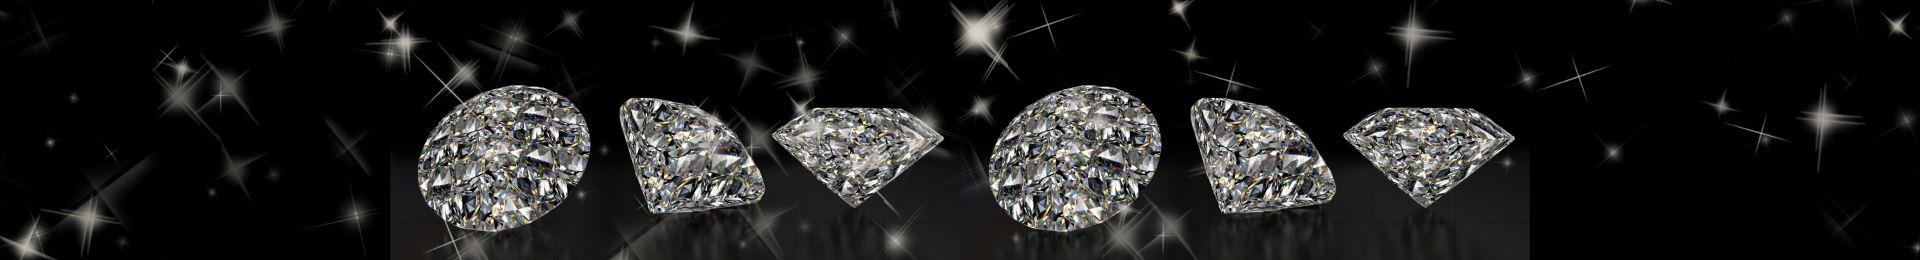 DiamondManufacturers